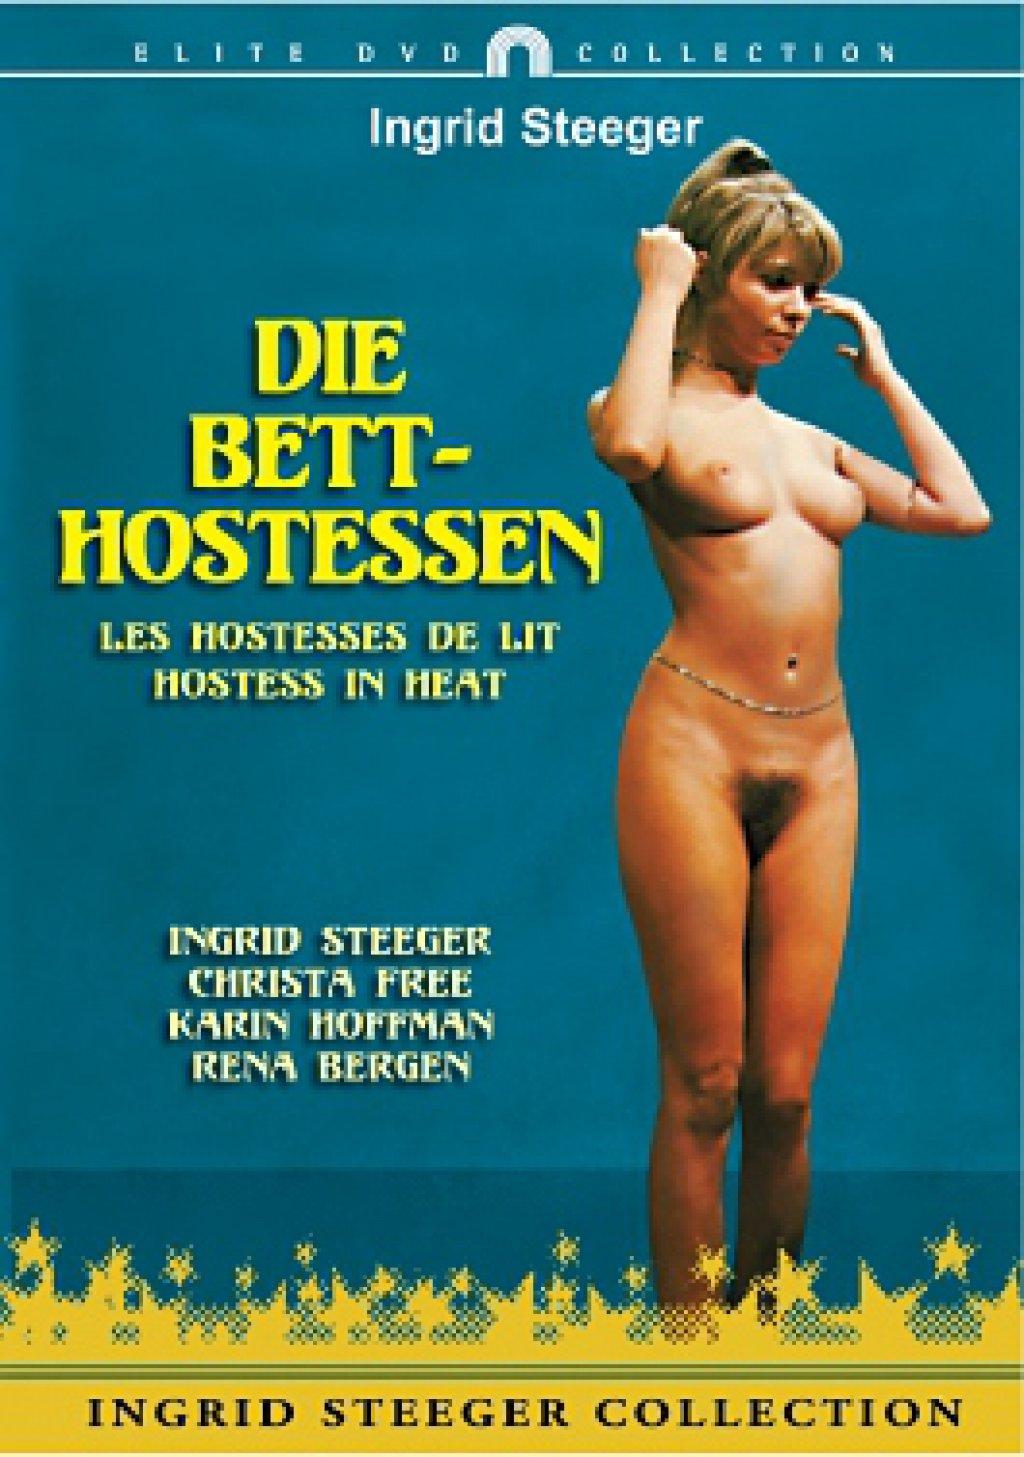 kinokomedii-erotika